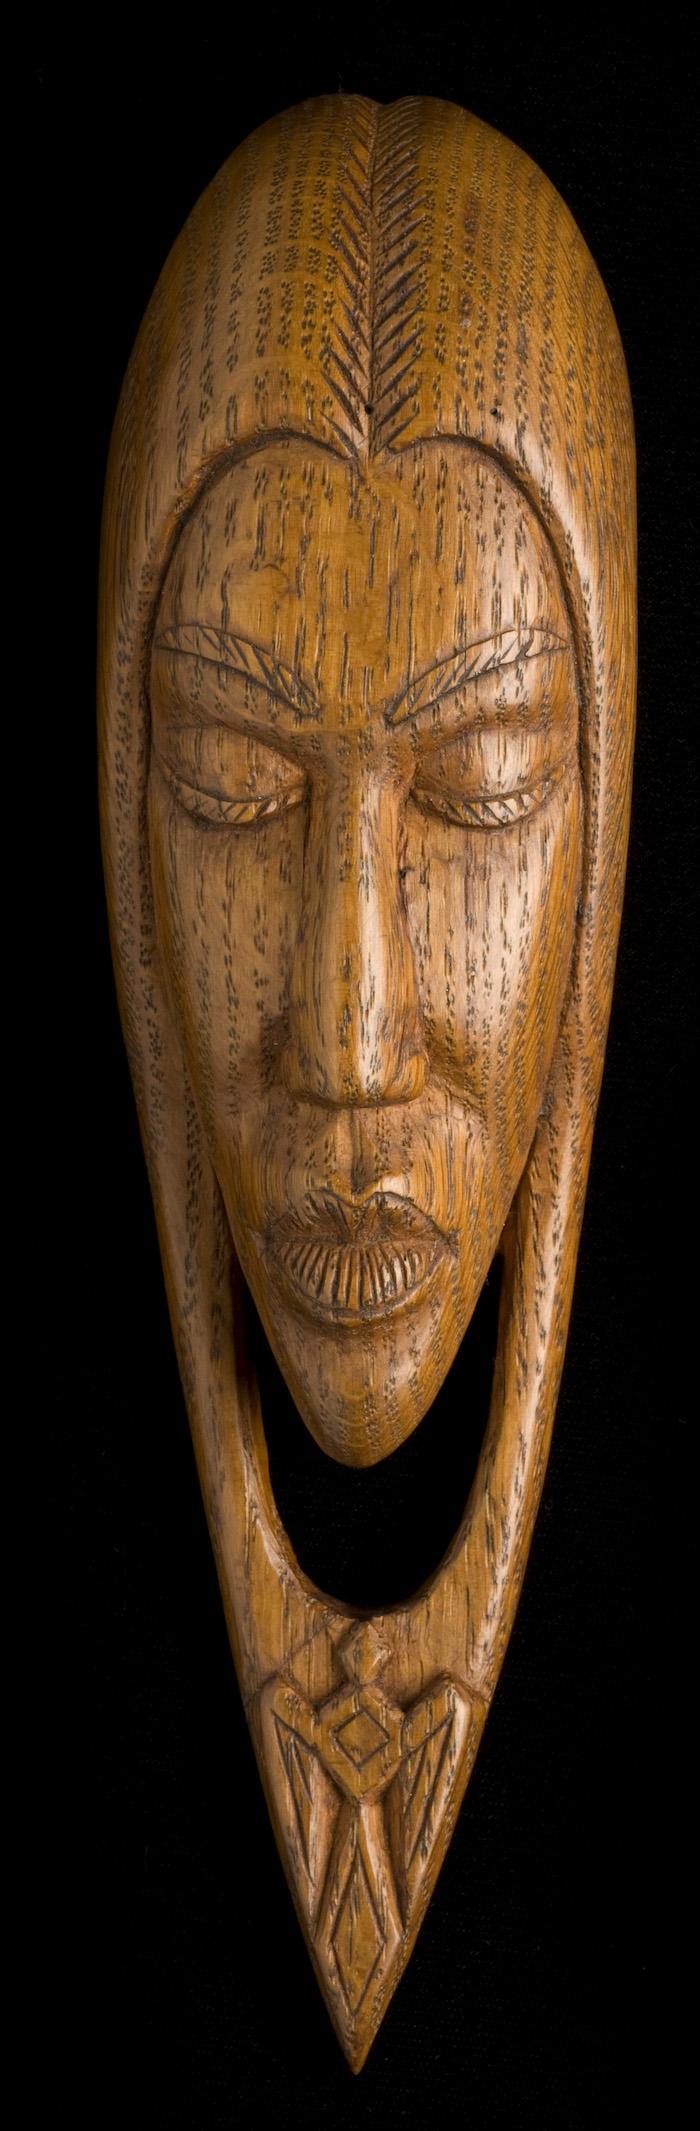 "Willard Stone, ""Modernistic Indian Girl"" (1946), oak wood, 9 x 2 1/2 x 1 3/4 inches (courtesy Gilcrease Museum)"